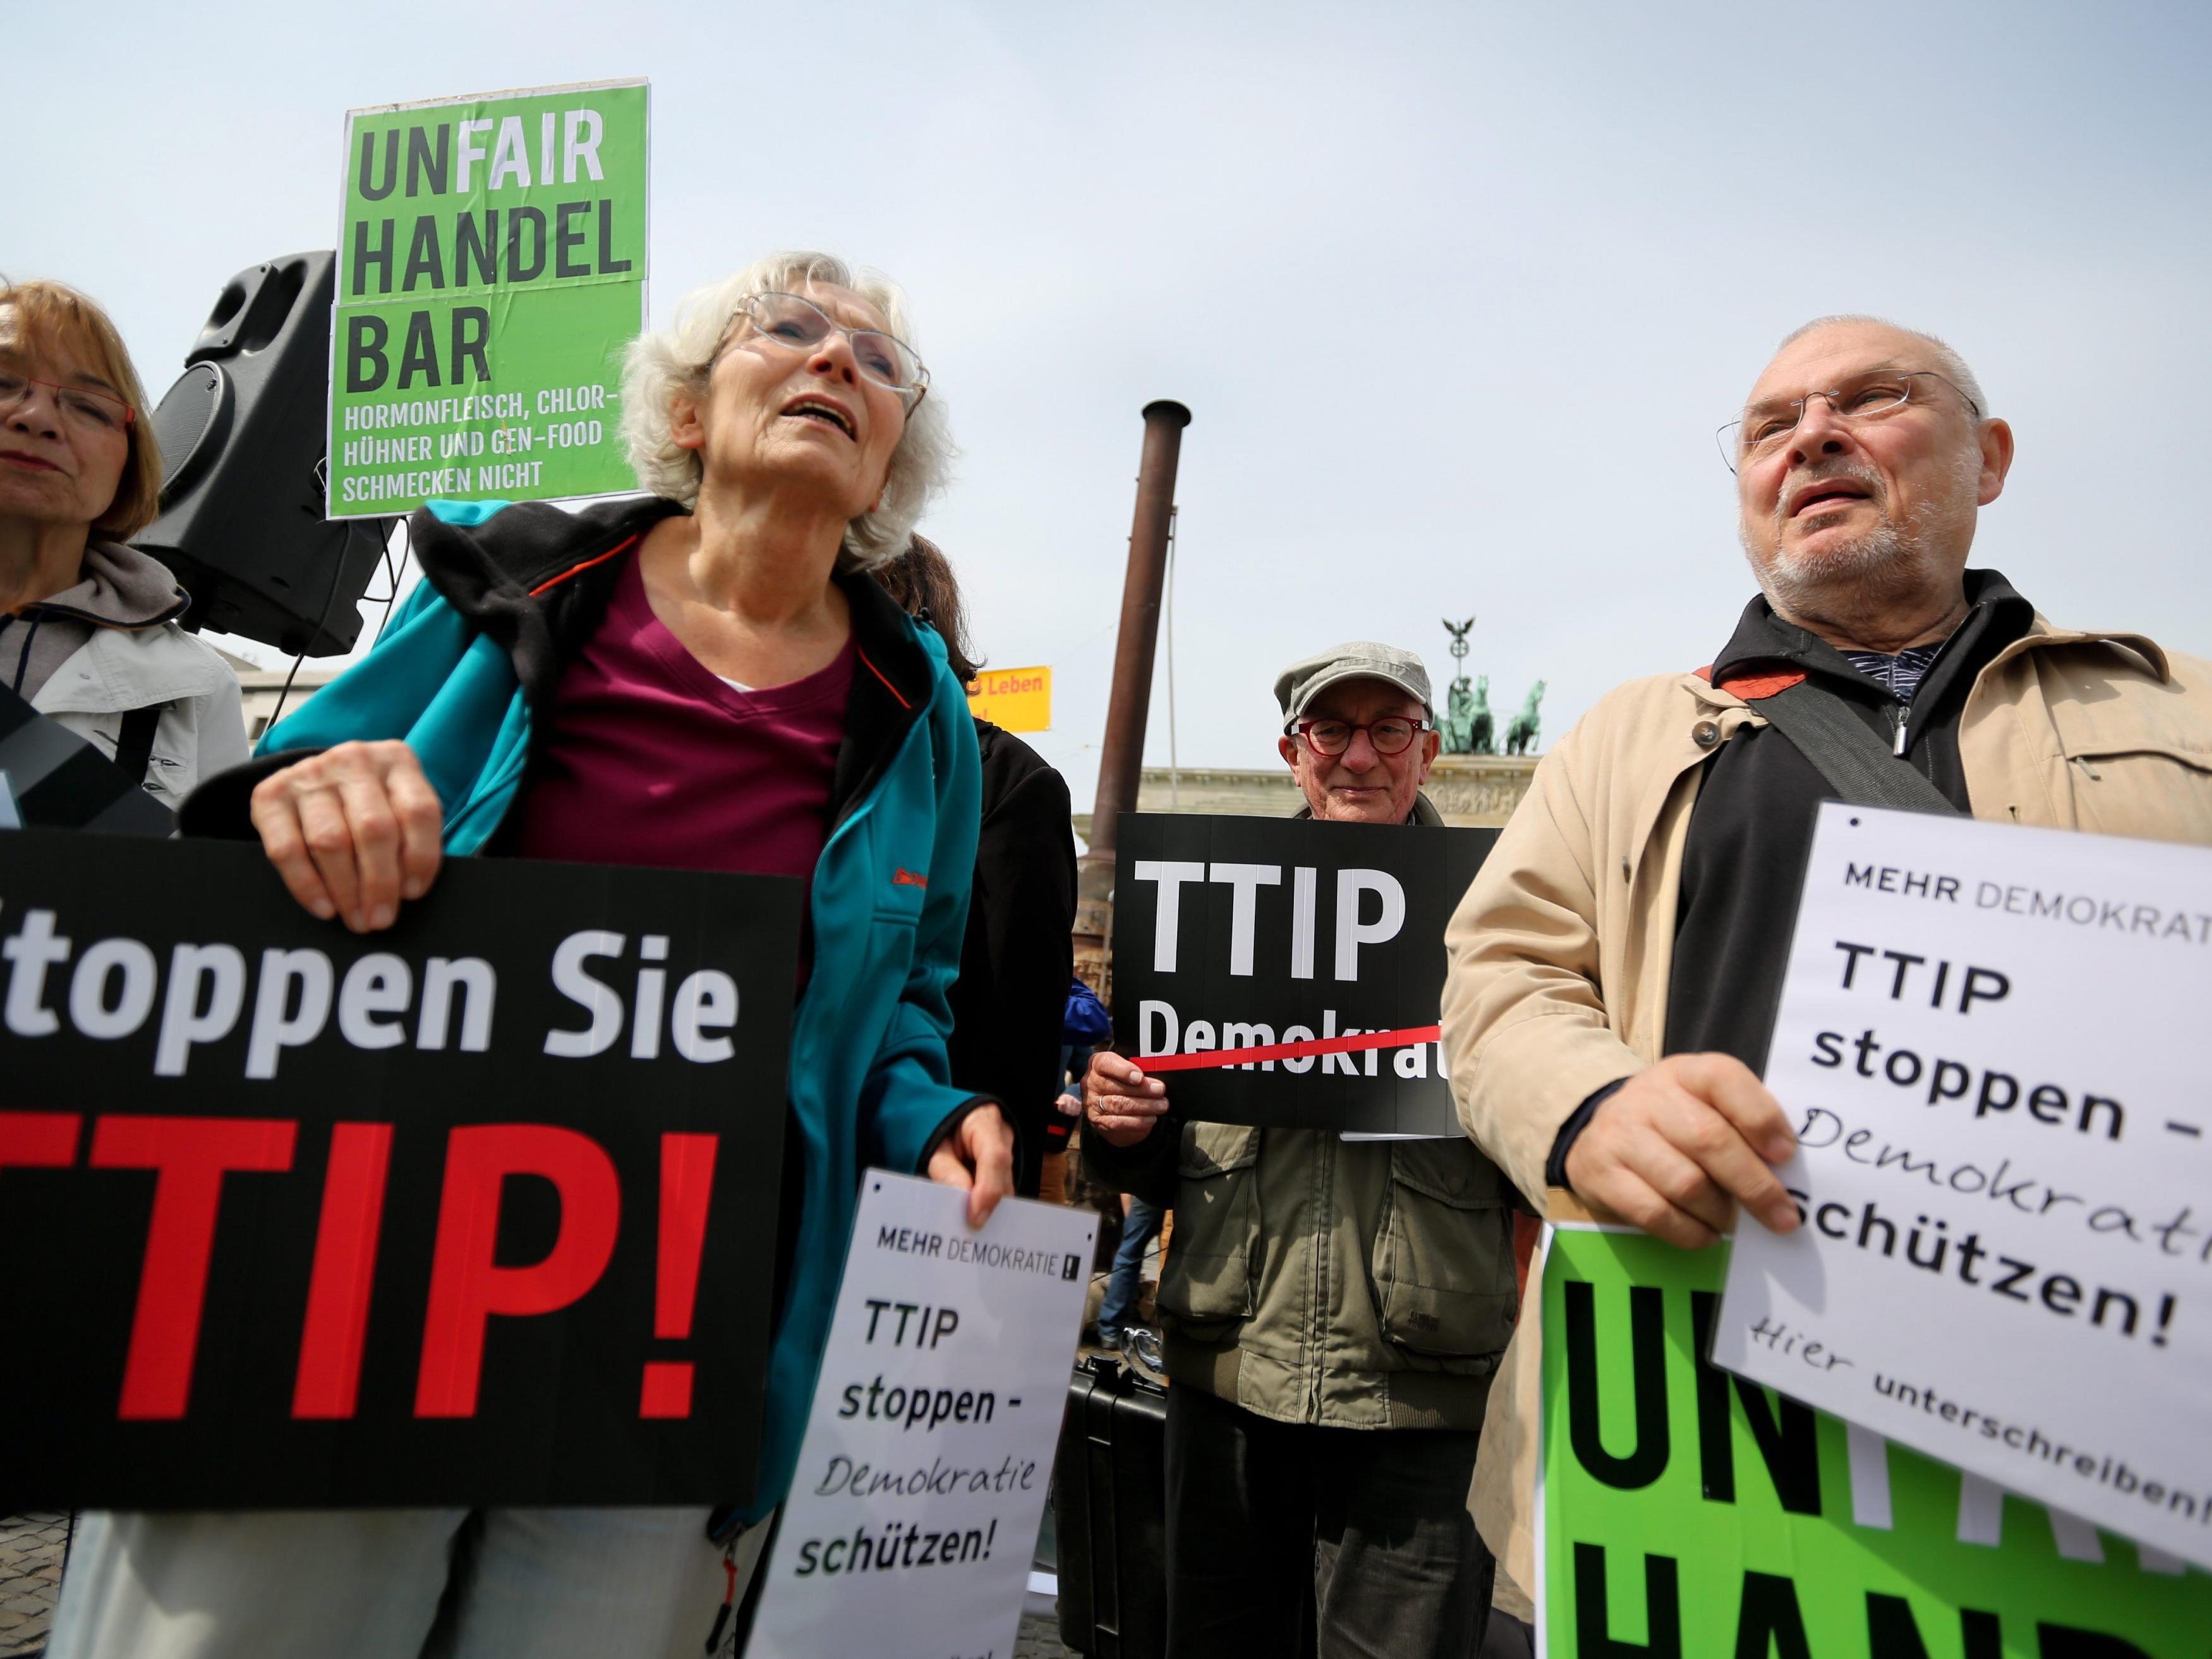 Proteste gegen TTIP werden immer lauter.